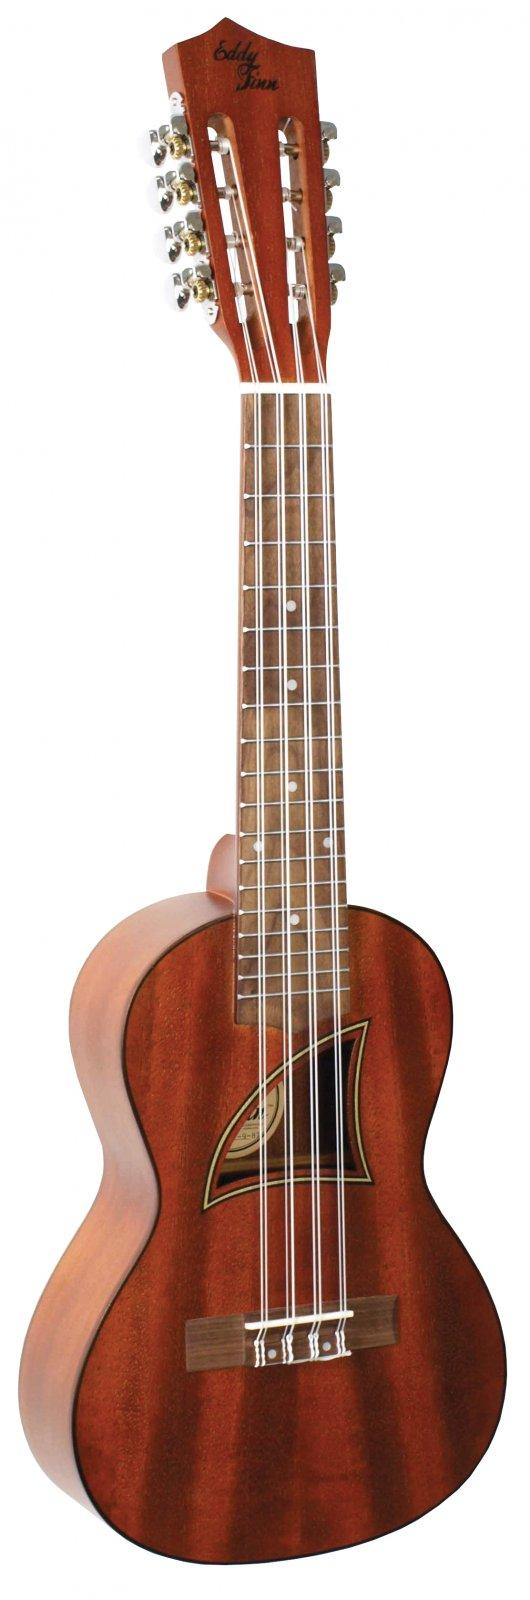 Eddy Finn EF-98T 8 String Tenor Ukulele